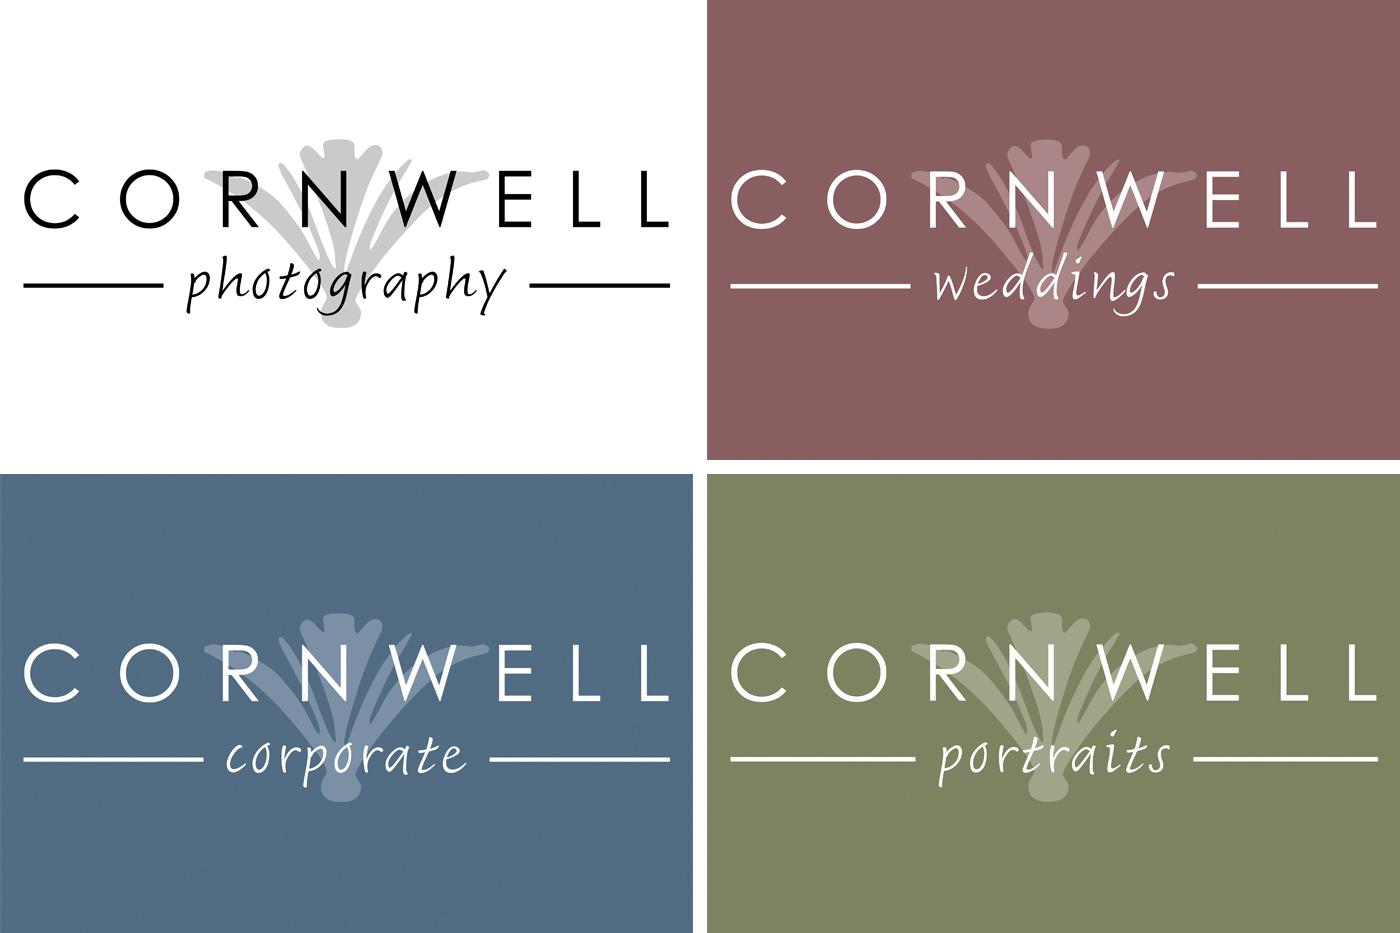 cornwell_2